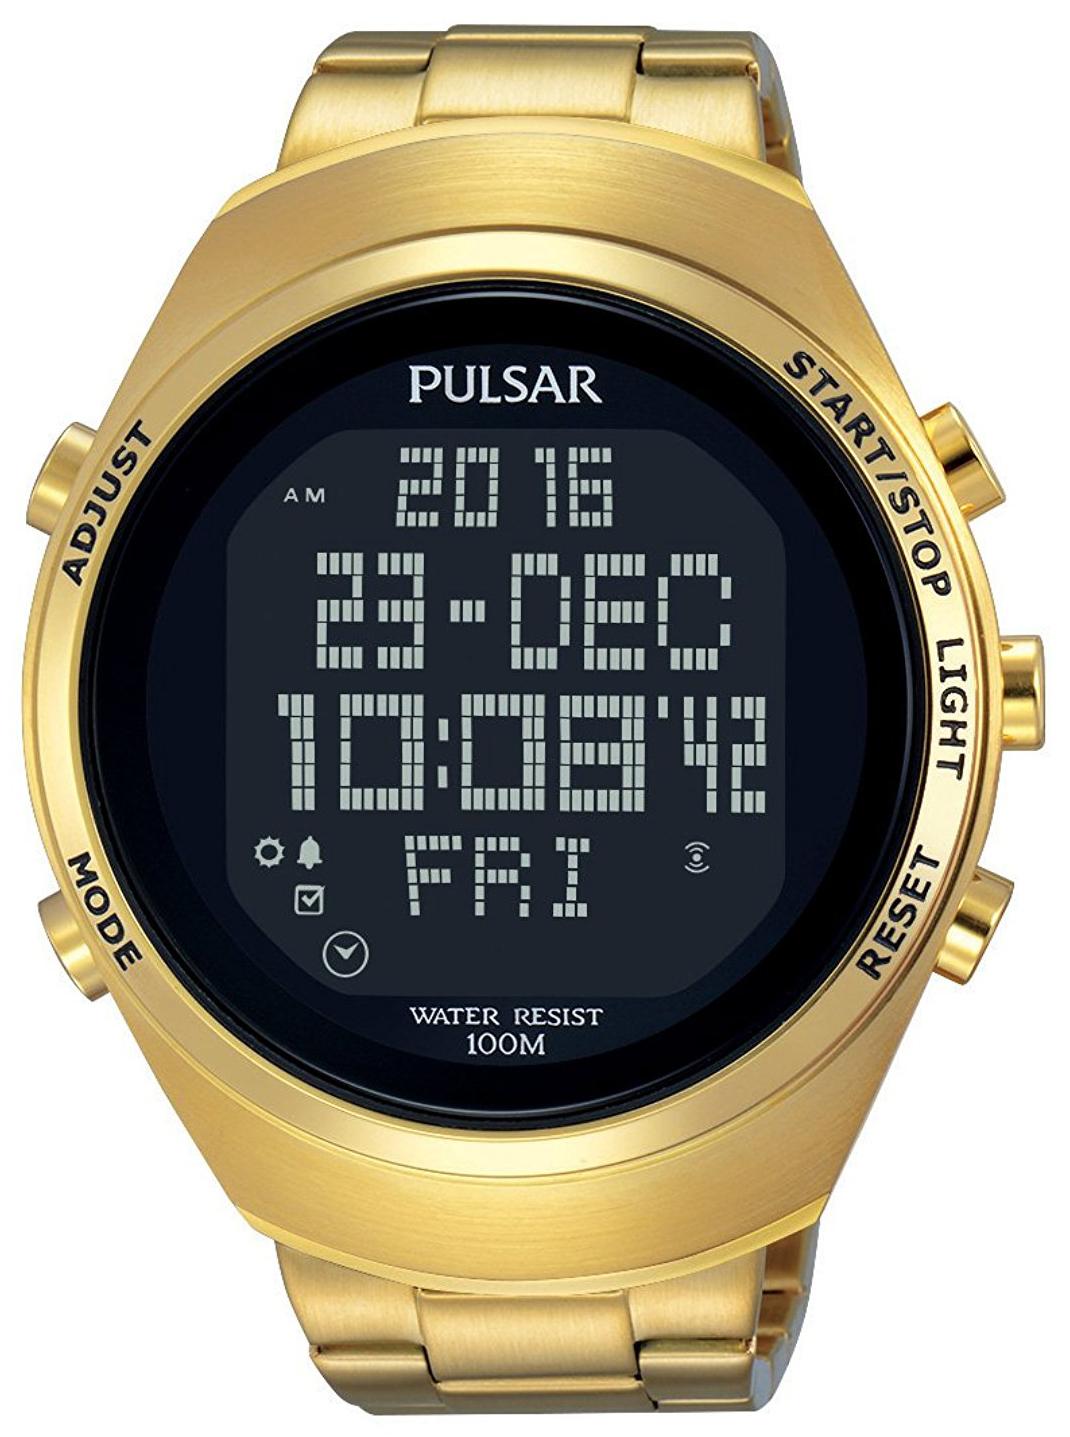 Pulsar Pulsar X Herrklocka PQ2056X1 LCD/Gulguldtonat stål Ø46 mm - Pulsar